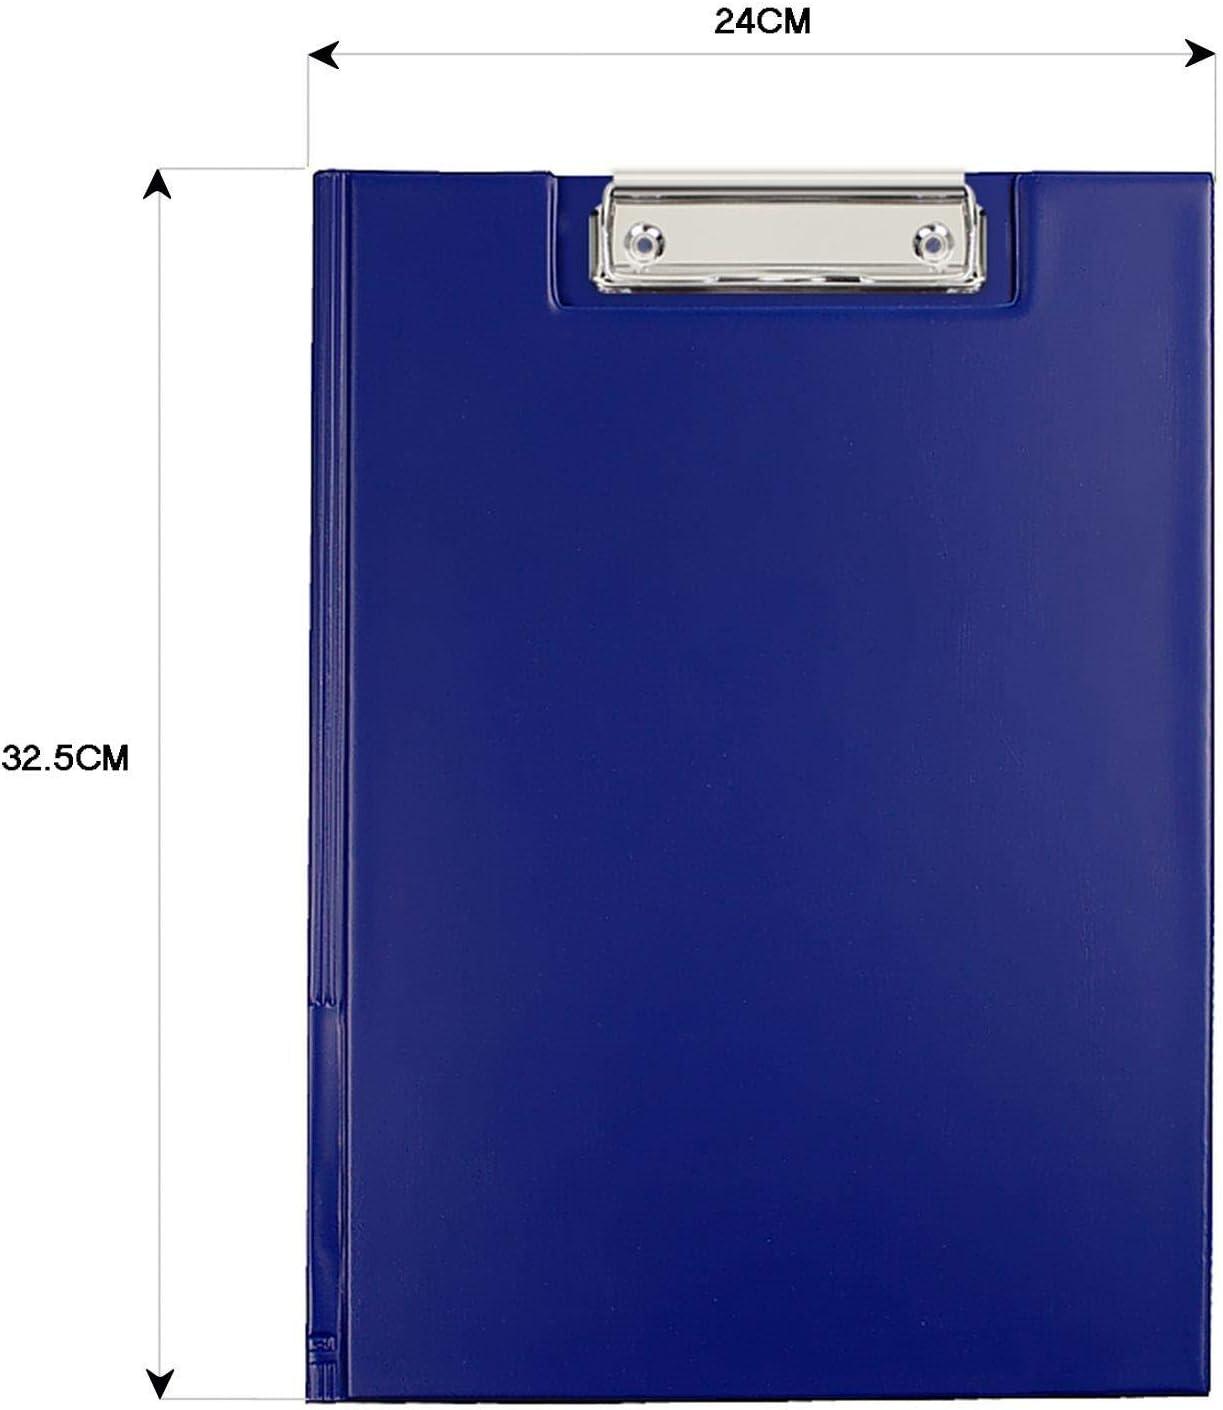 OfficeCentre Black A4 Quality Folding Clip Board Waterproof Paper Storage Pen Holder